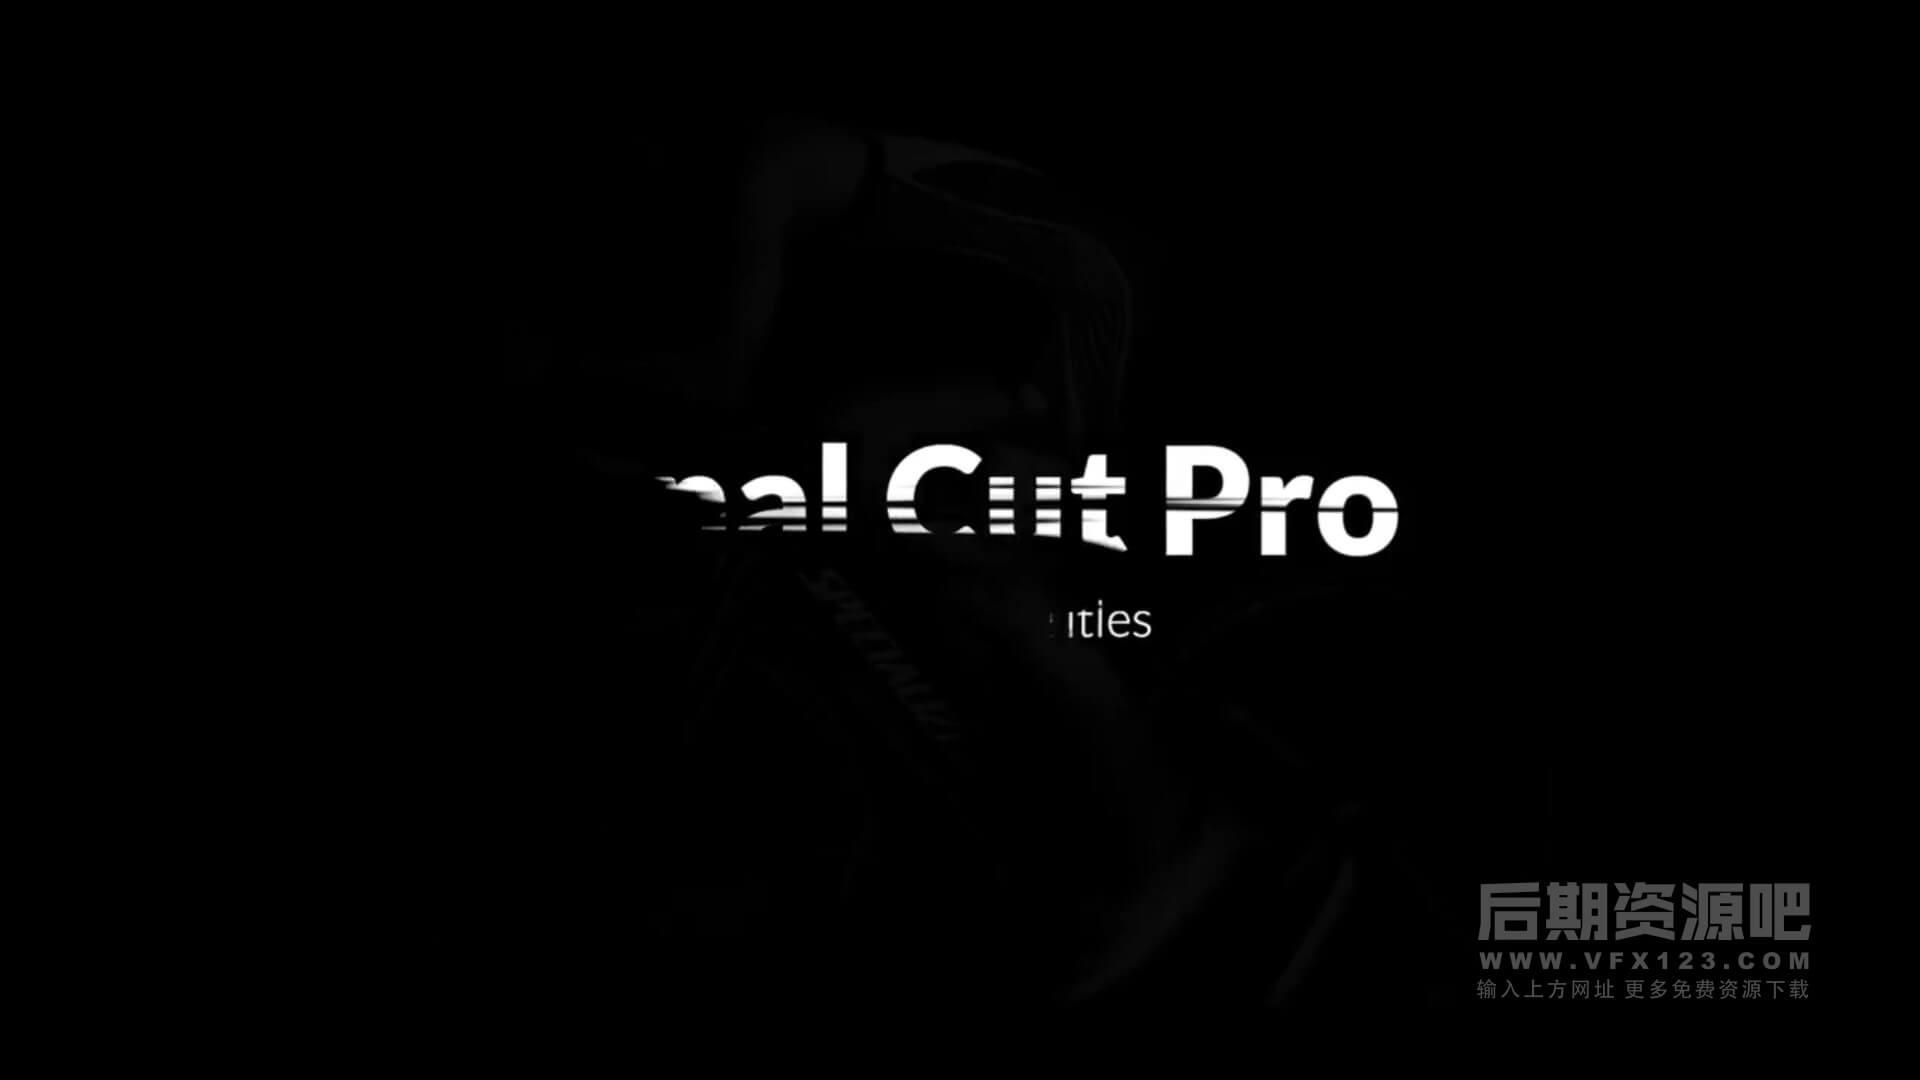 fcpx标题插件 笔刷遮罩文字擦除效果动画模板 Titles Animator Grunge Brush